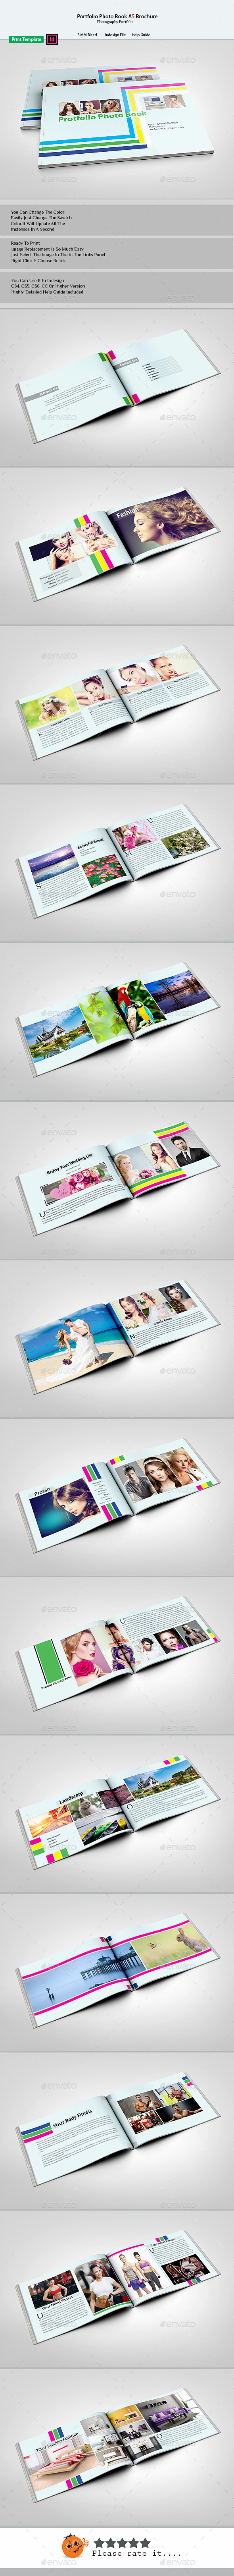 Portfolio Photo Book Brochure - Portfolio Brochures